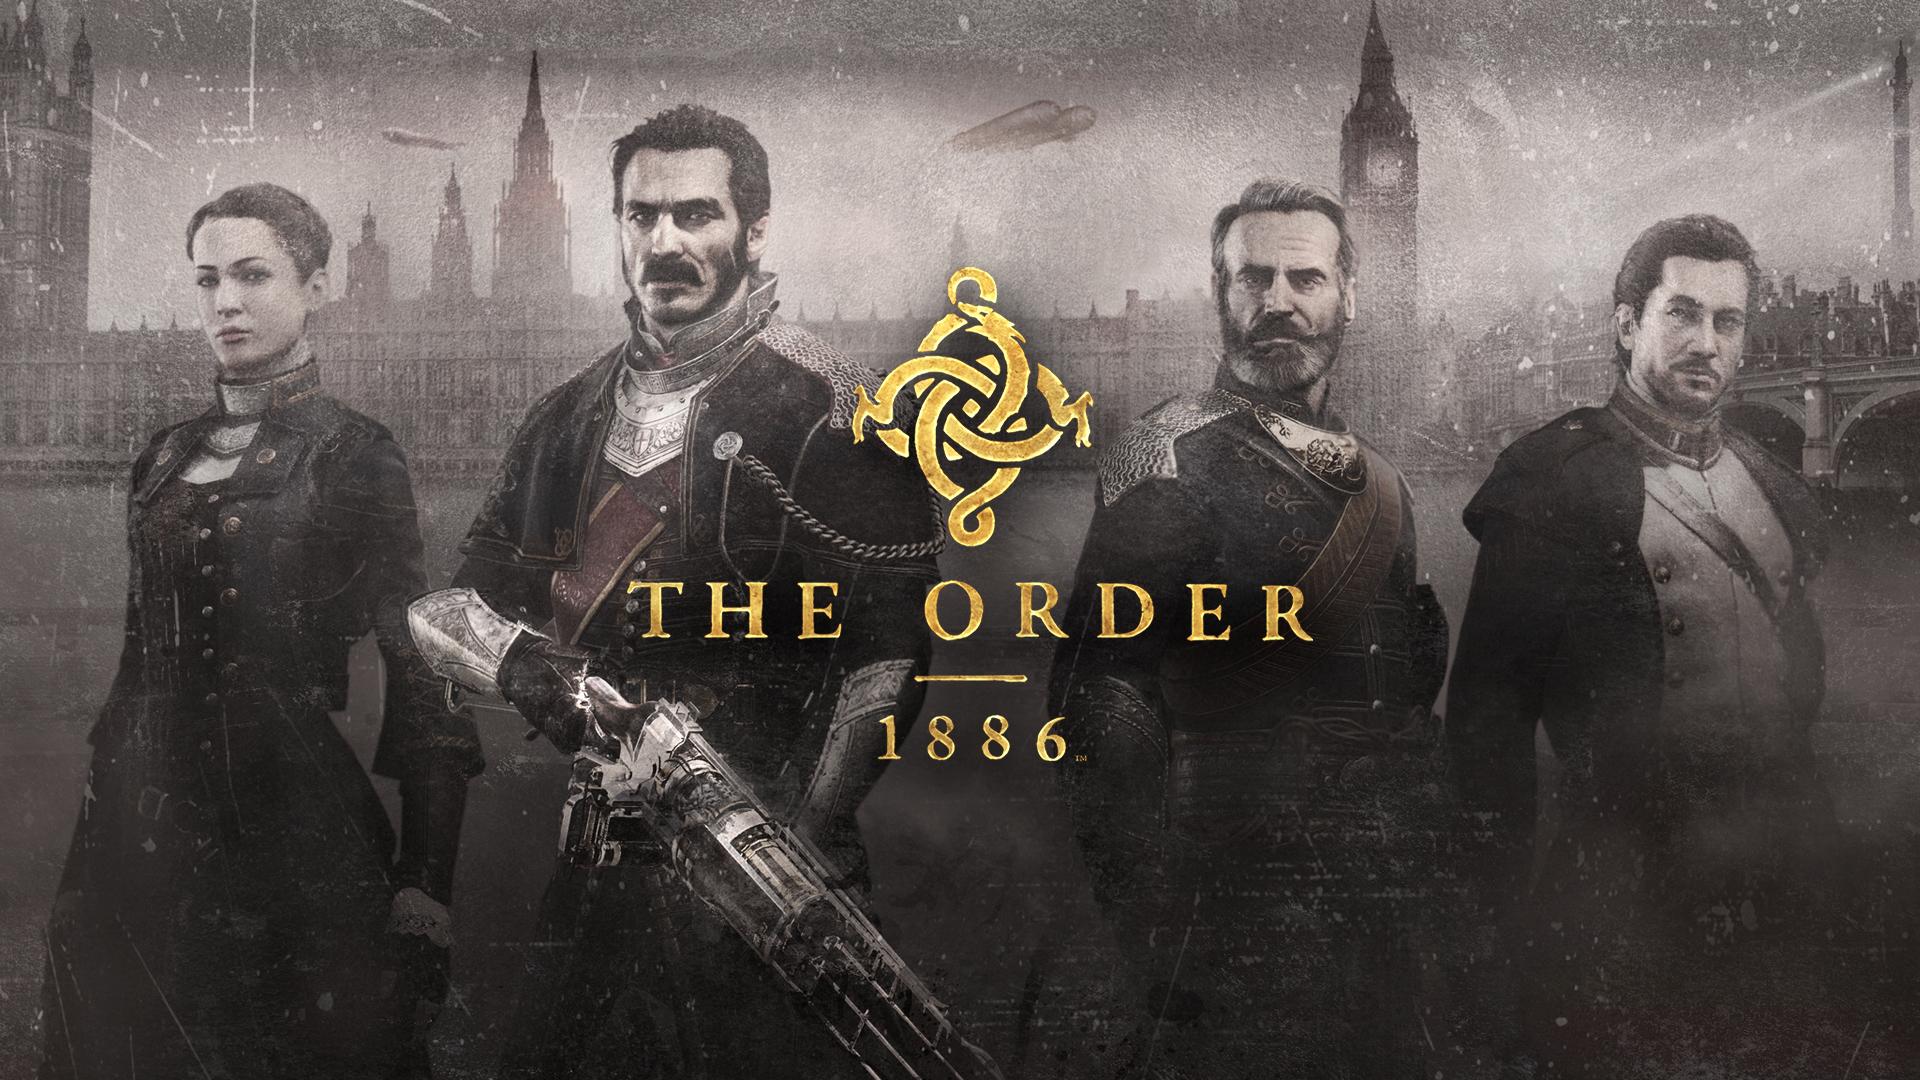 The Order 1886 (junior environment-artist)